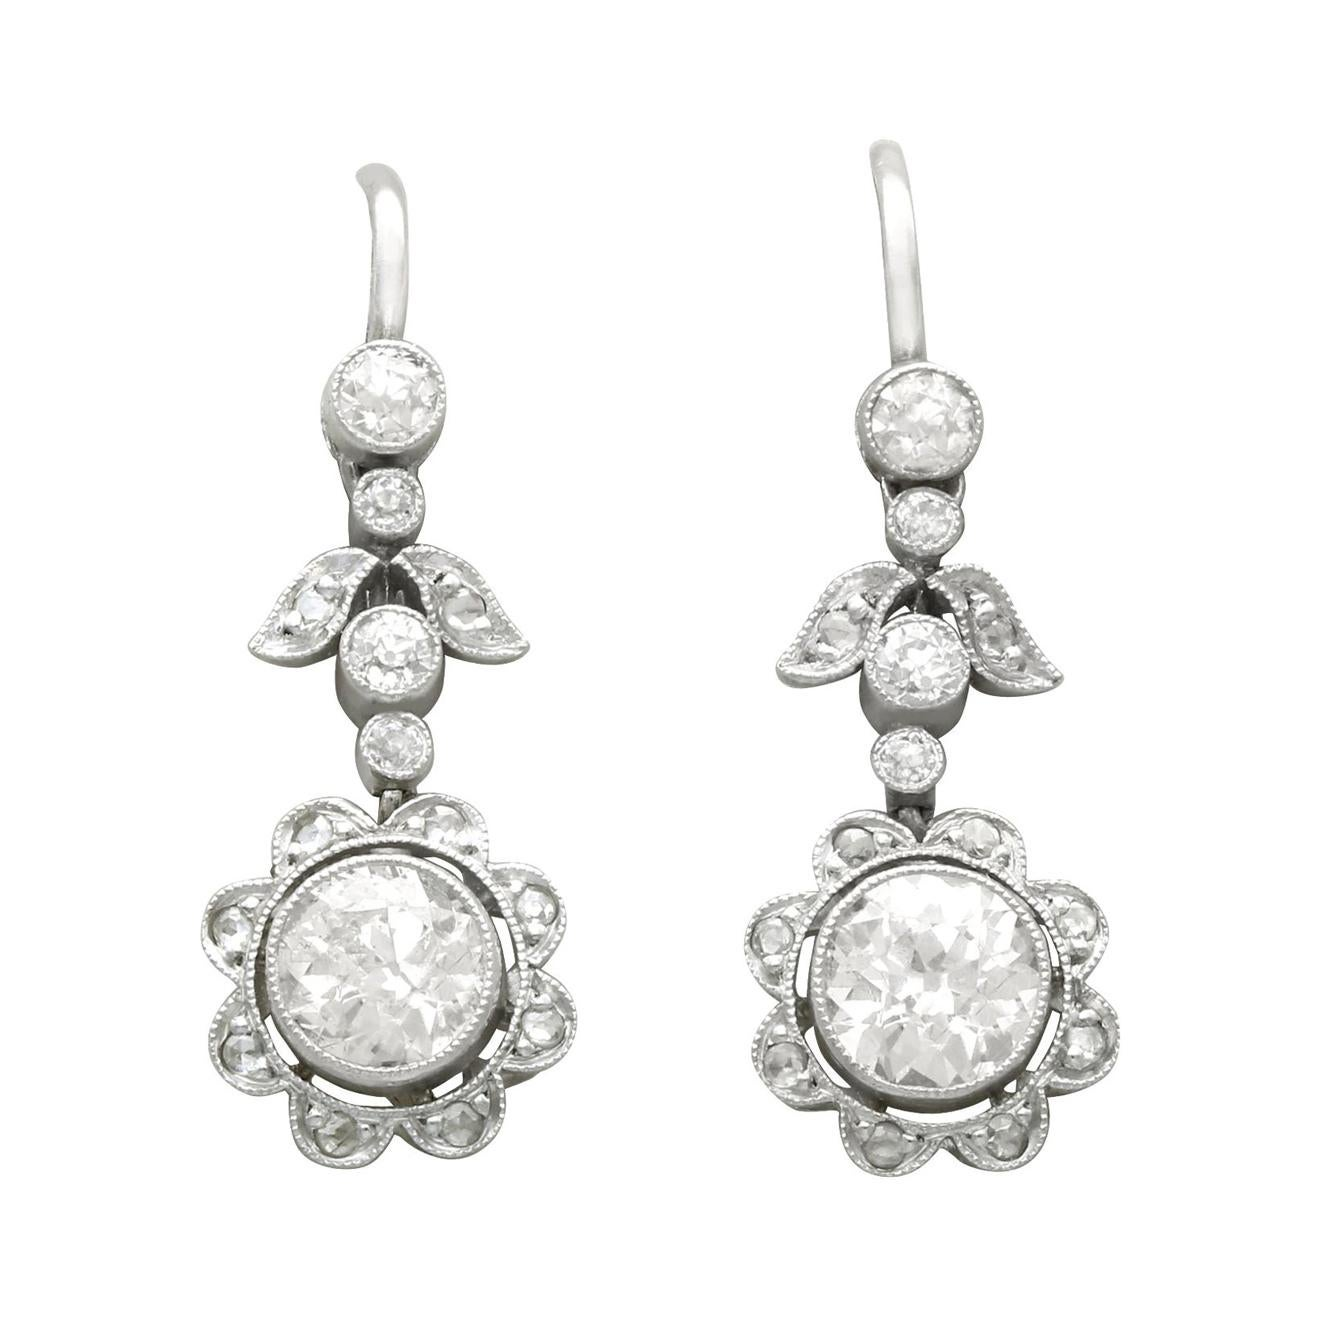 Antique 1.42 Carat Diamond and Platinum Drop Earrings, Circa 1920